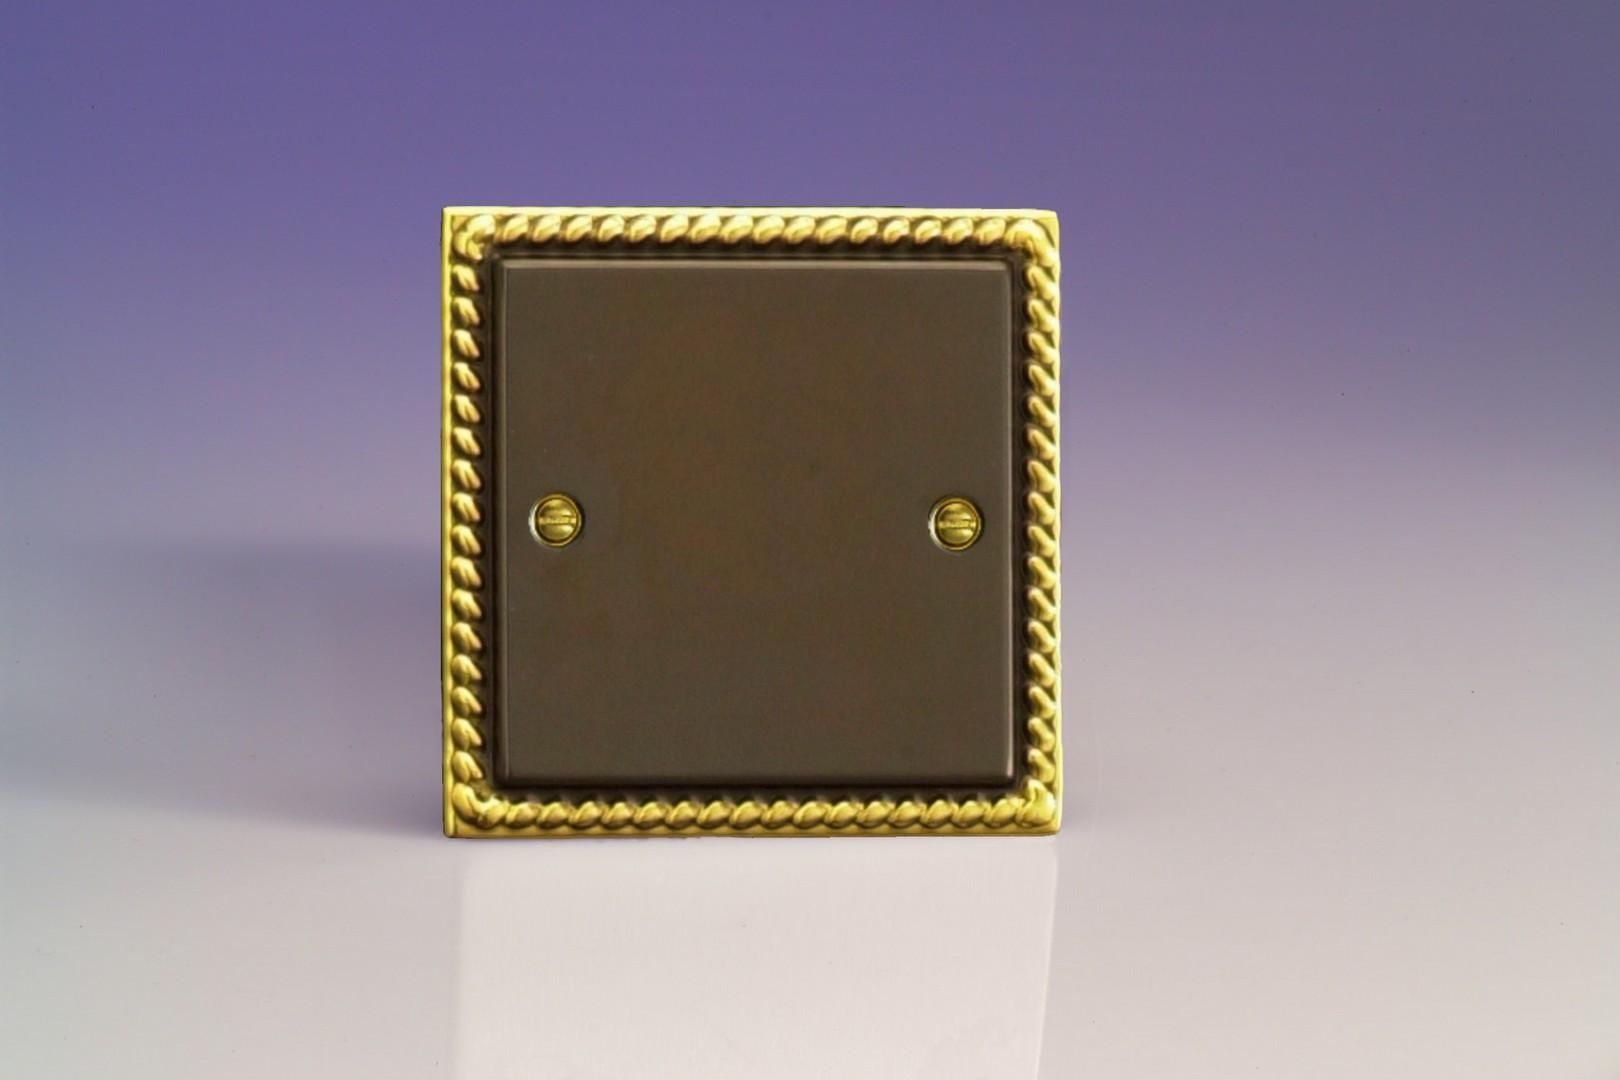 0.001mm Graduation 0-25mm Range Friction Thimble Starrett 788MEXFL LCD Micrometer Carbide Faces Lock Nut